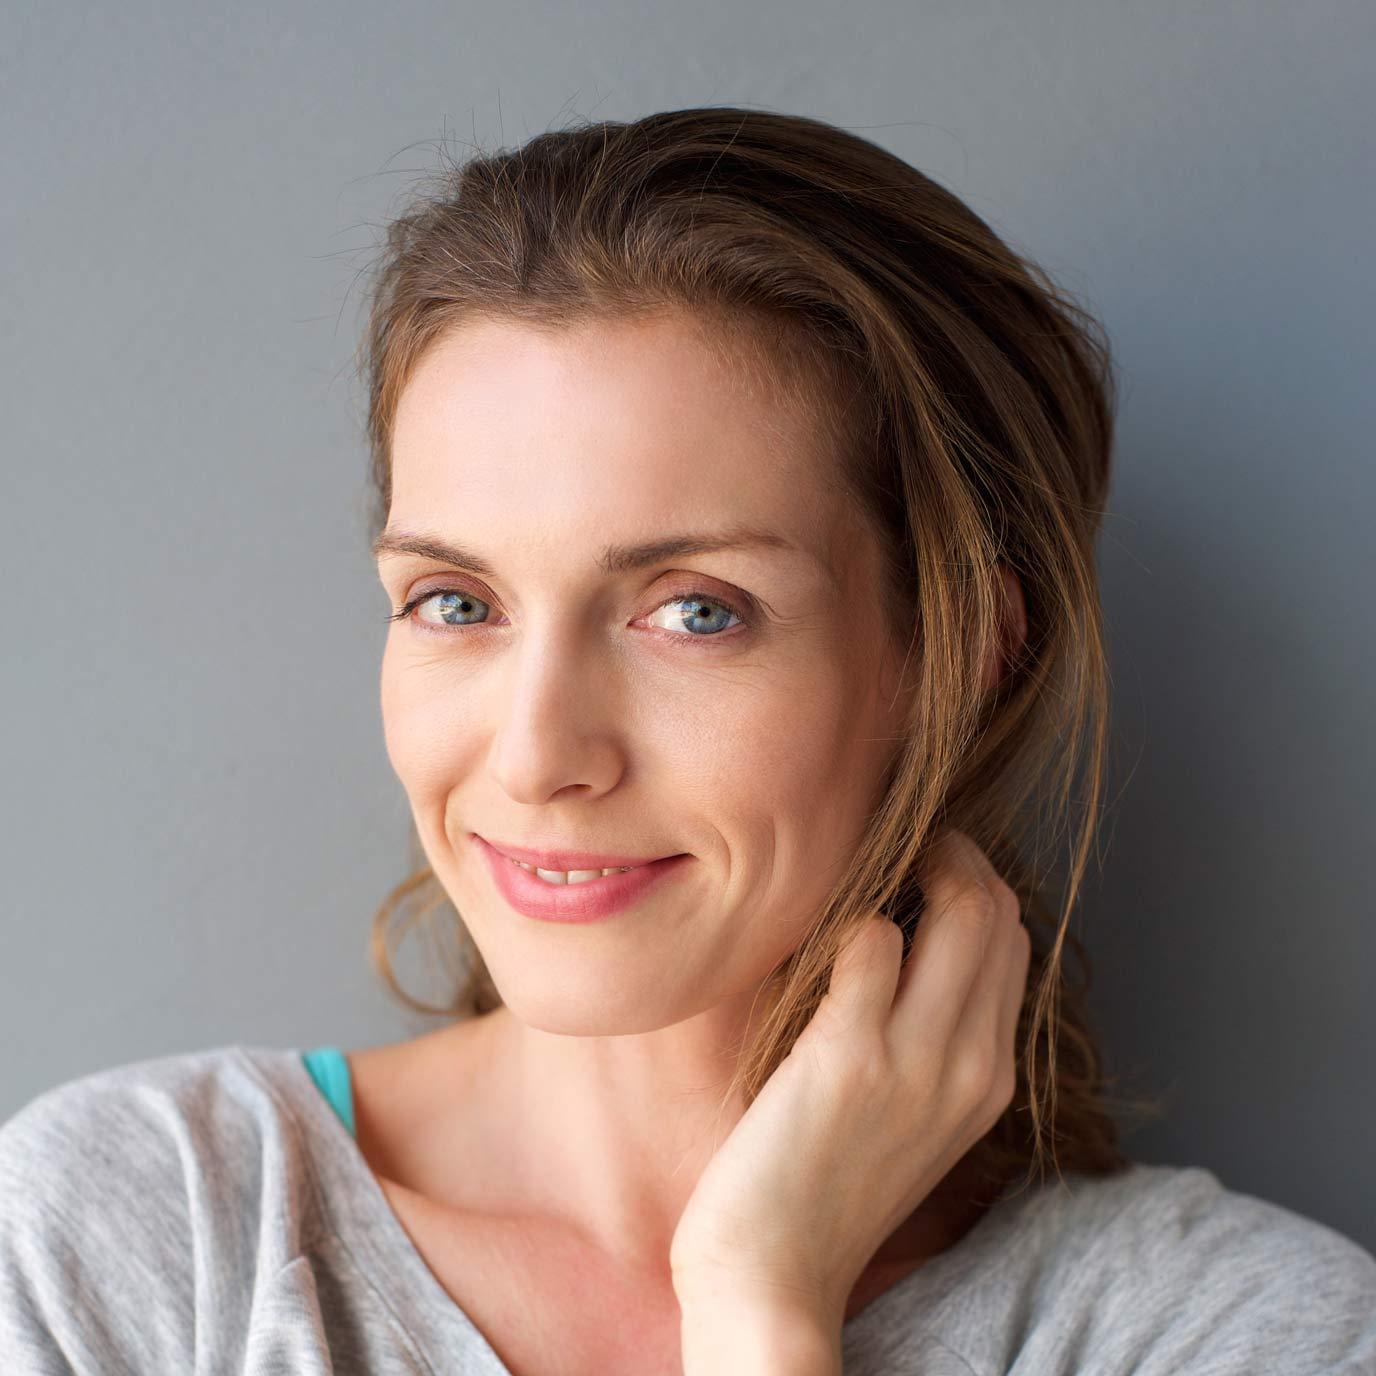 The Emma Guns Show – Dr Elaine McQuaide on Perimenopause